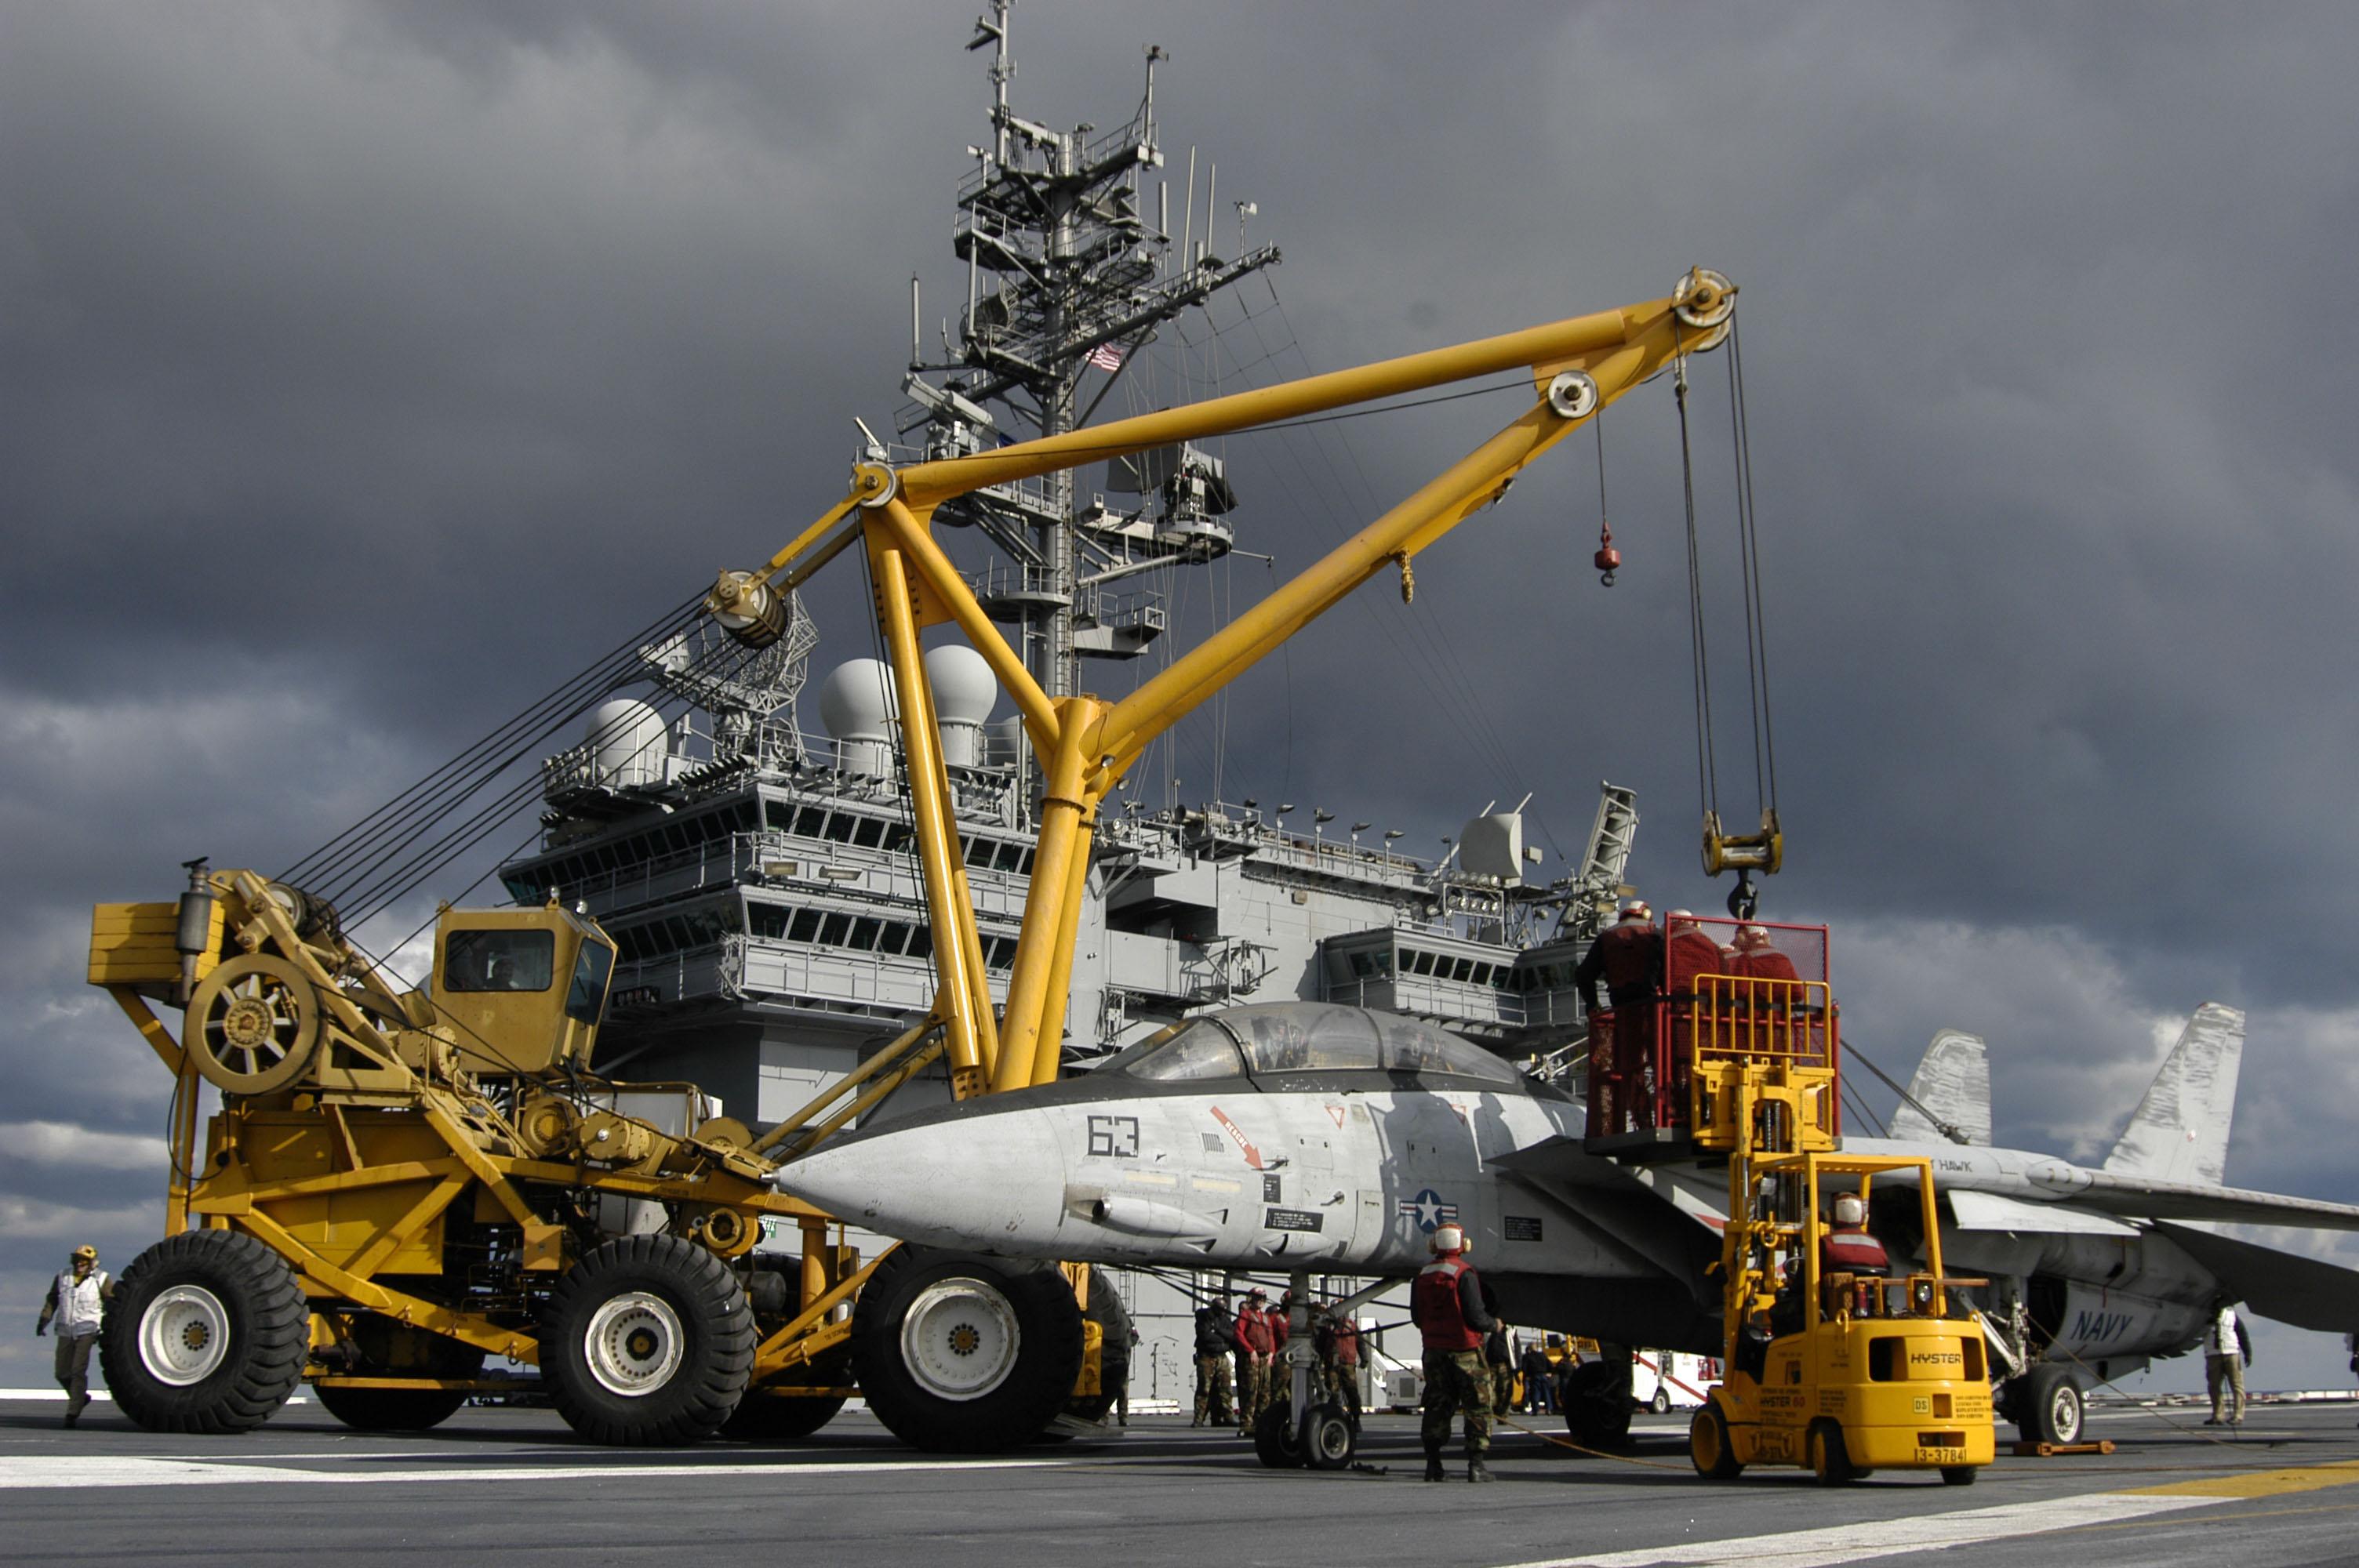 File:US Navy 050113-N-5781F-041 Crash-and-salvage